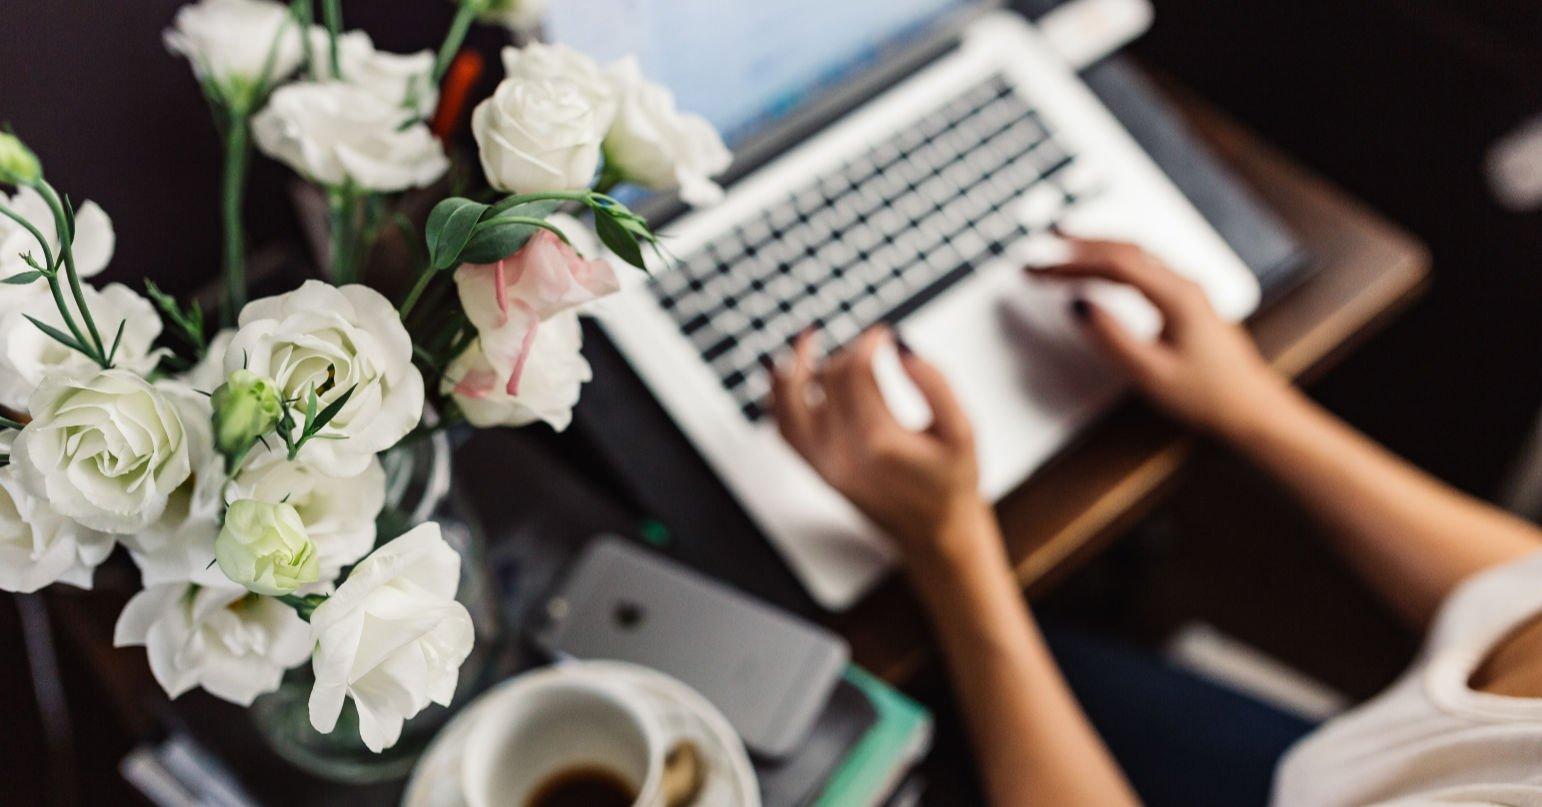 laptop wit woman working